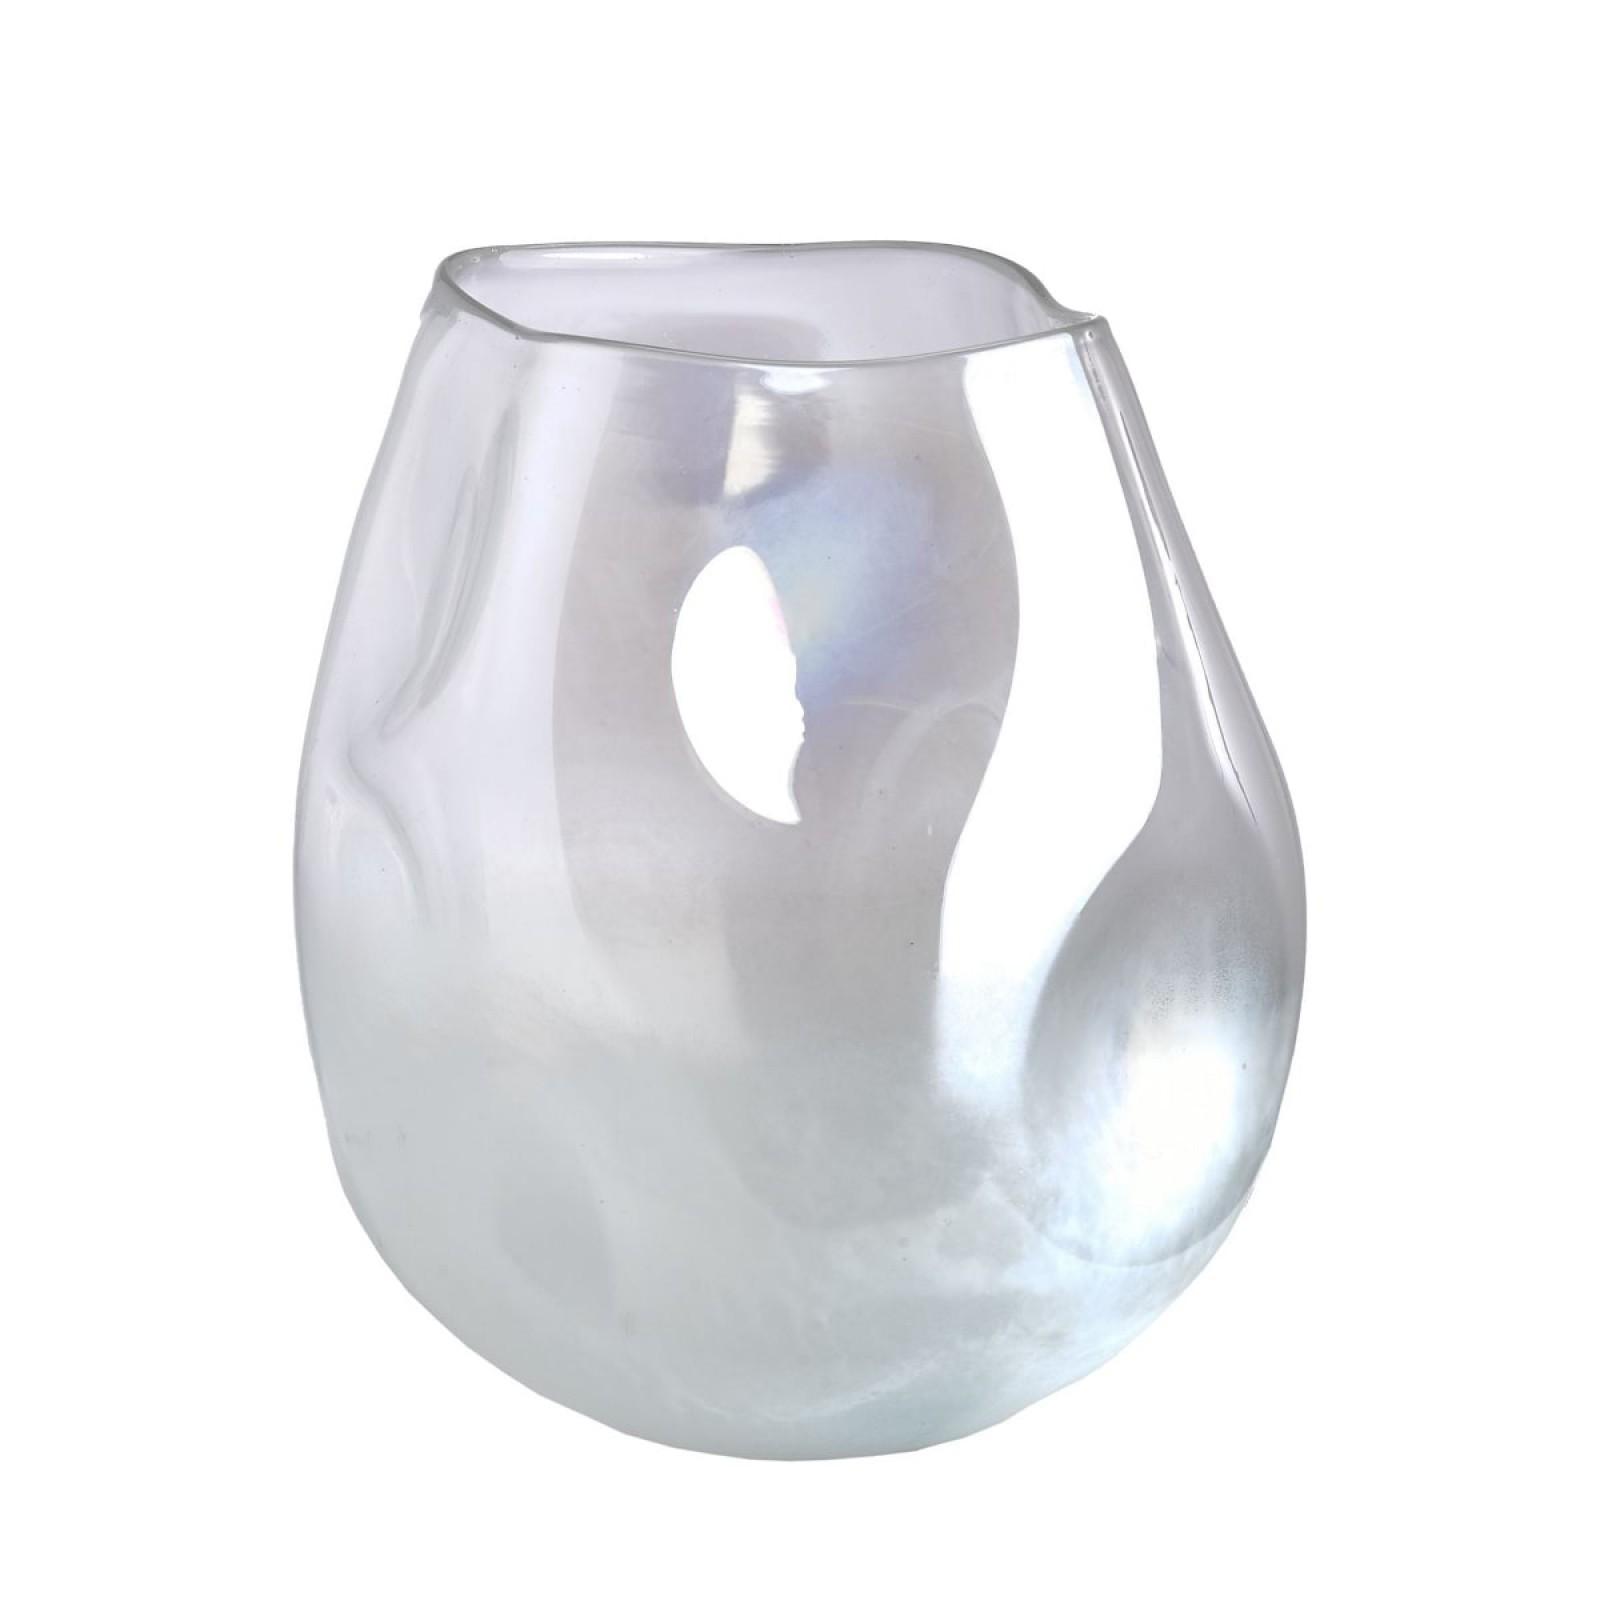 Collision Vase White - Pols Potten